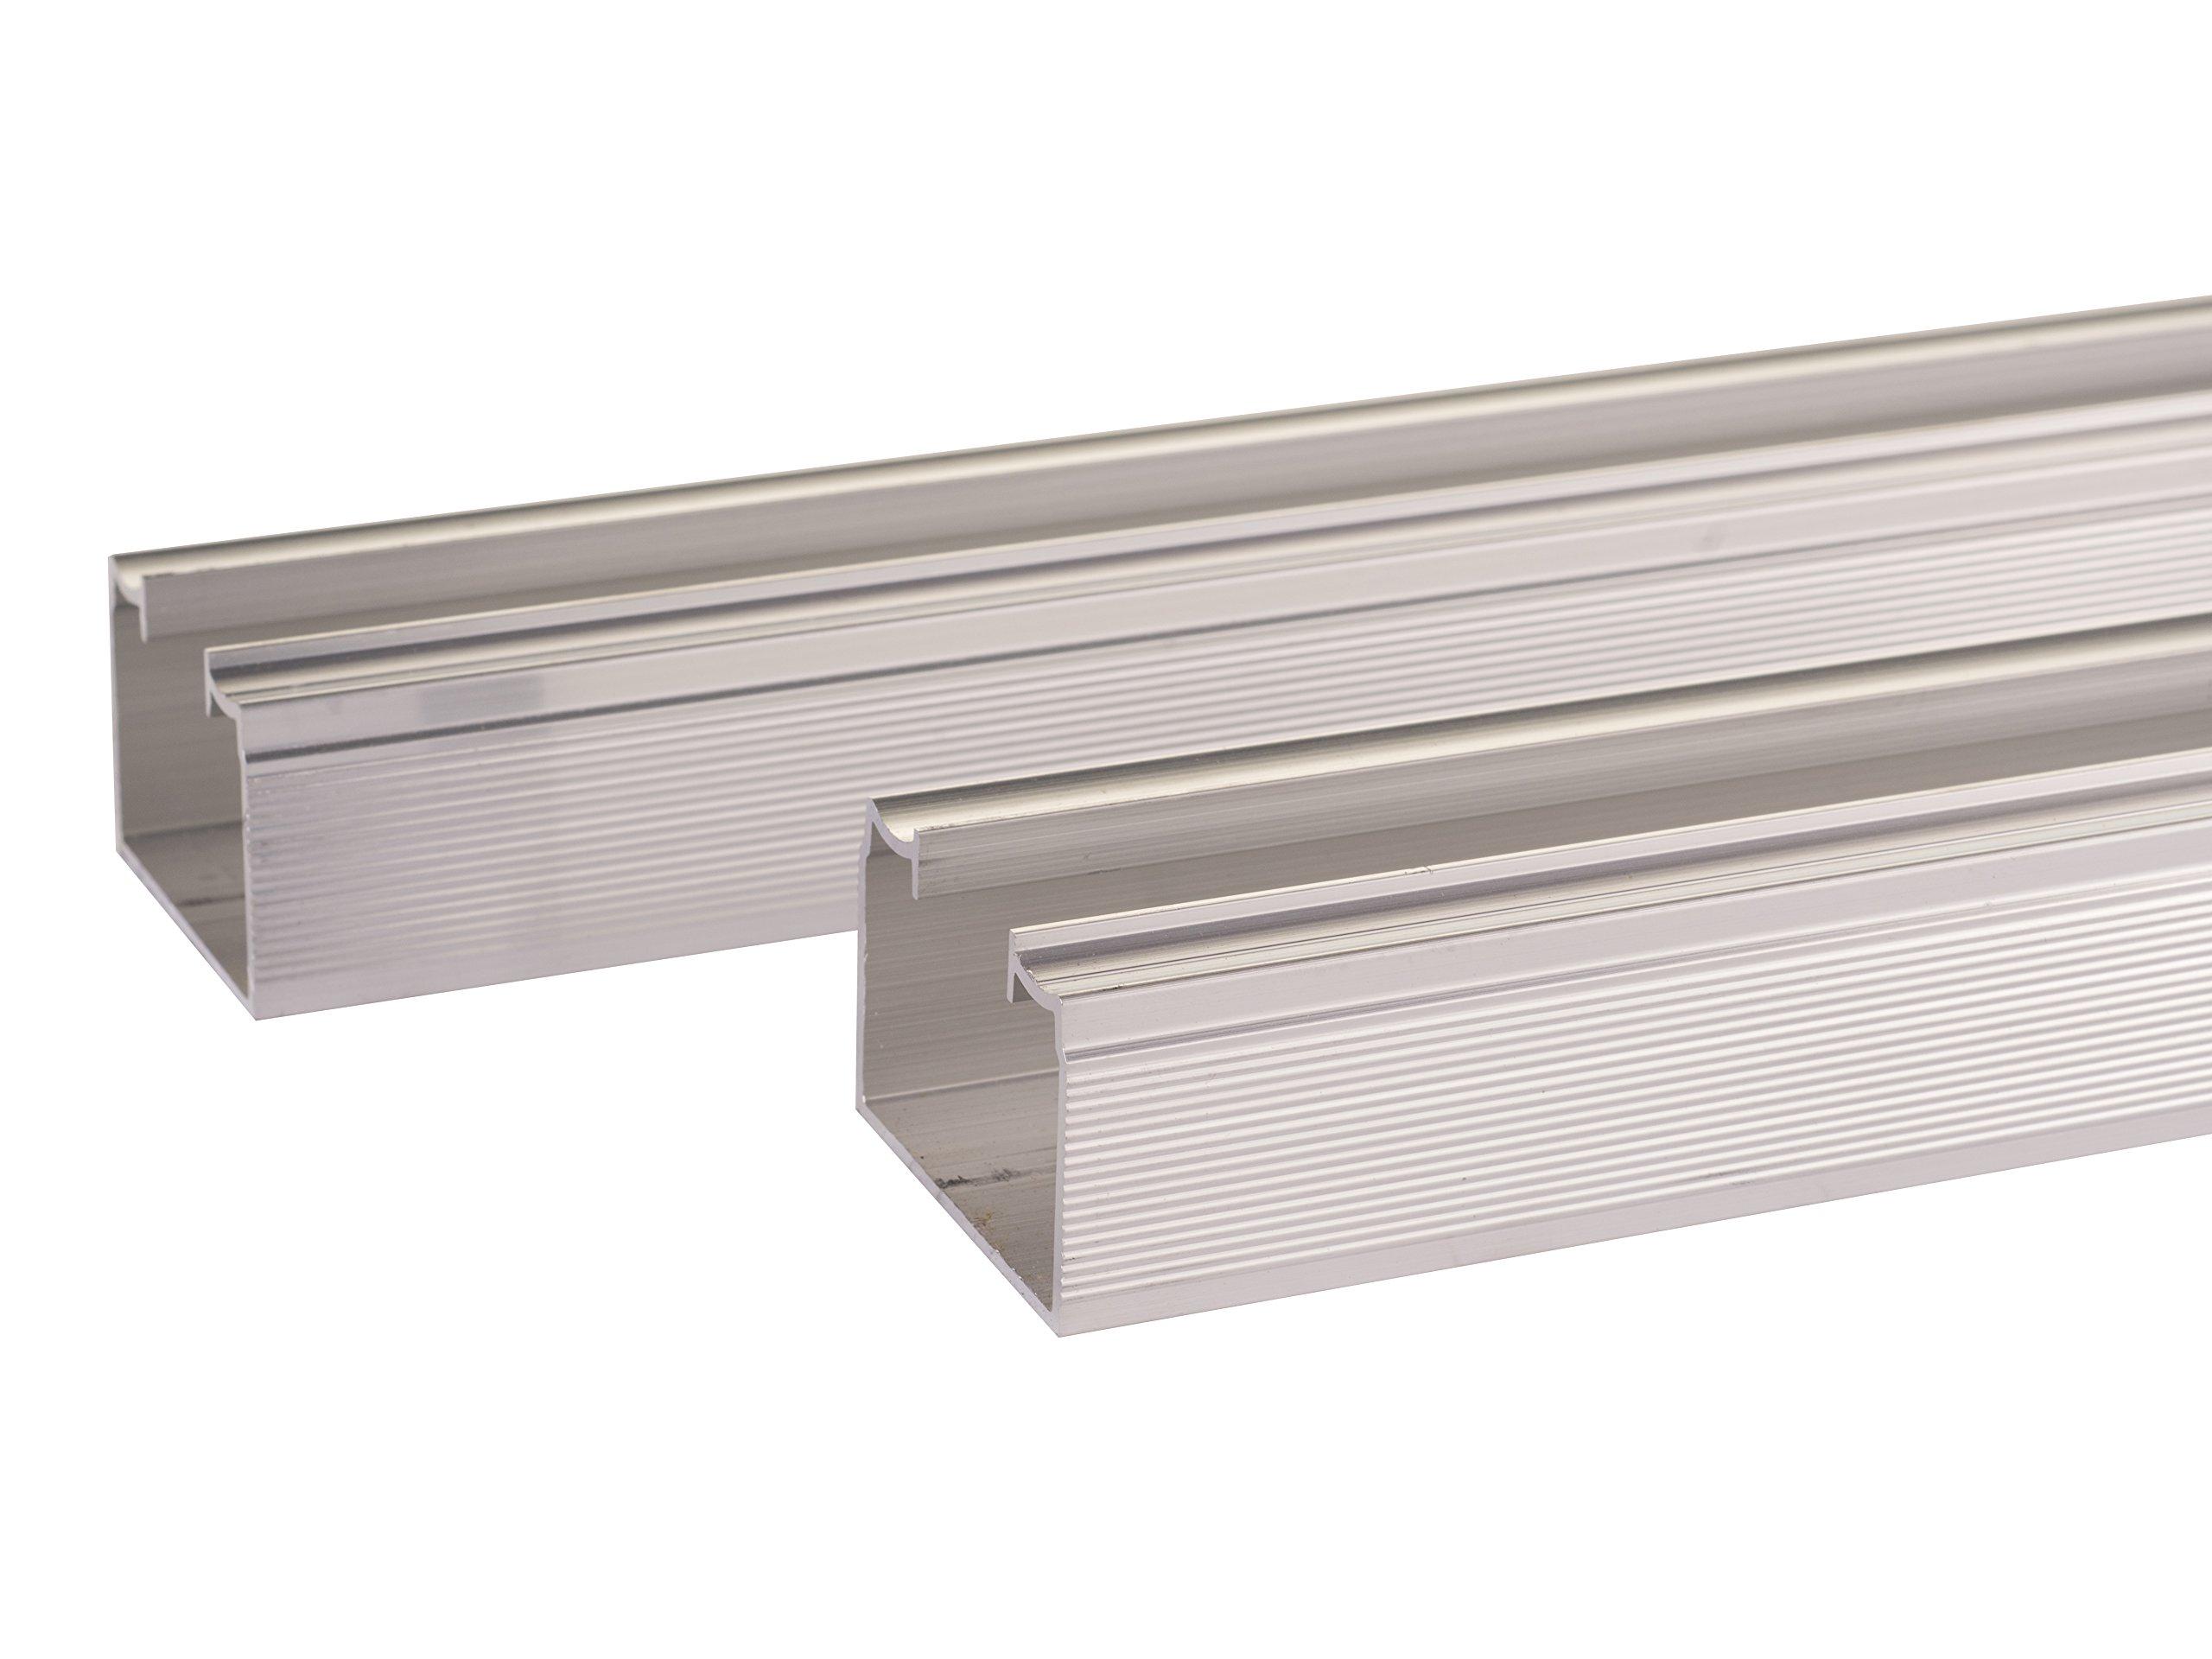 100SD Sliding Bypass Door Hardware (96 In. Length 2 Door System) by Johnson Hardware (Image #2)